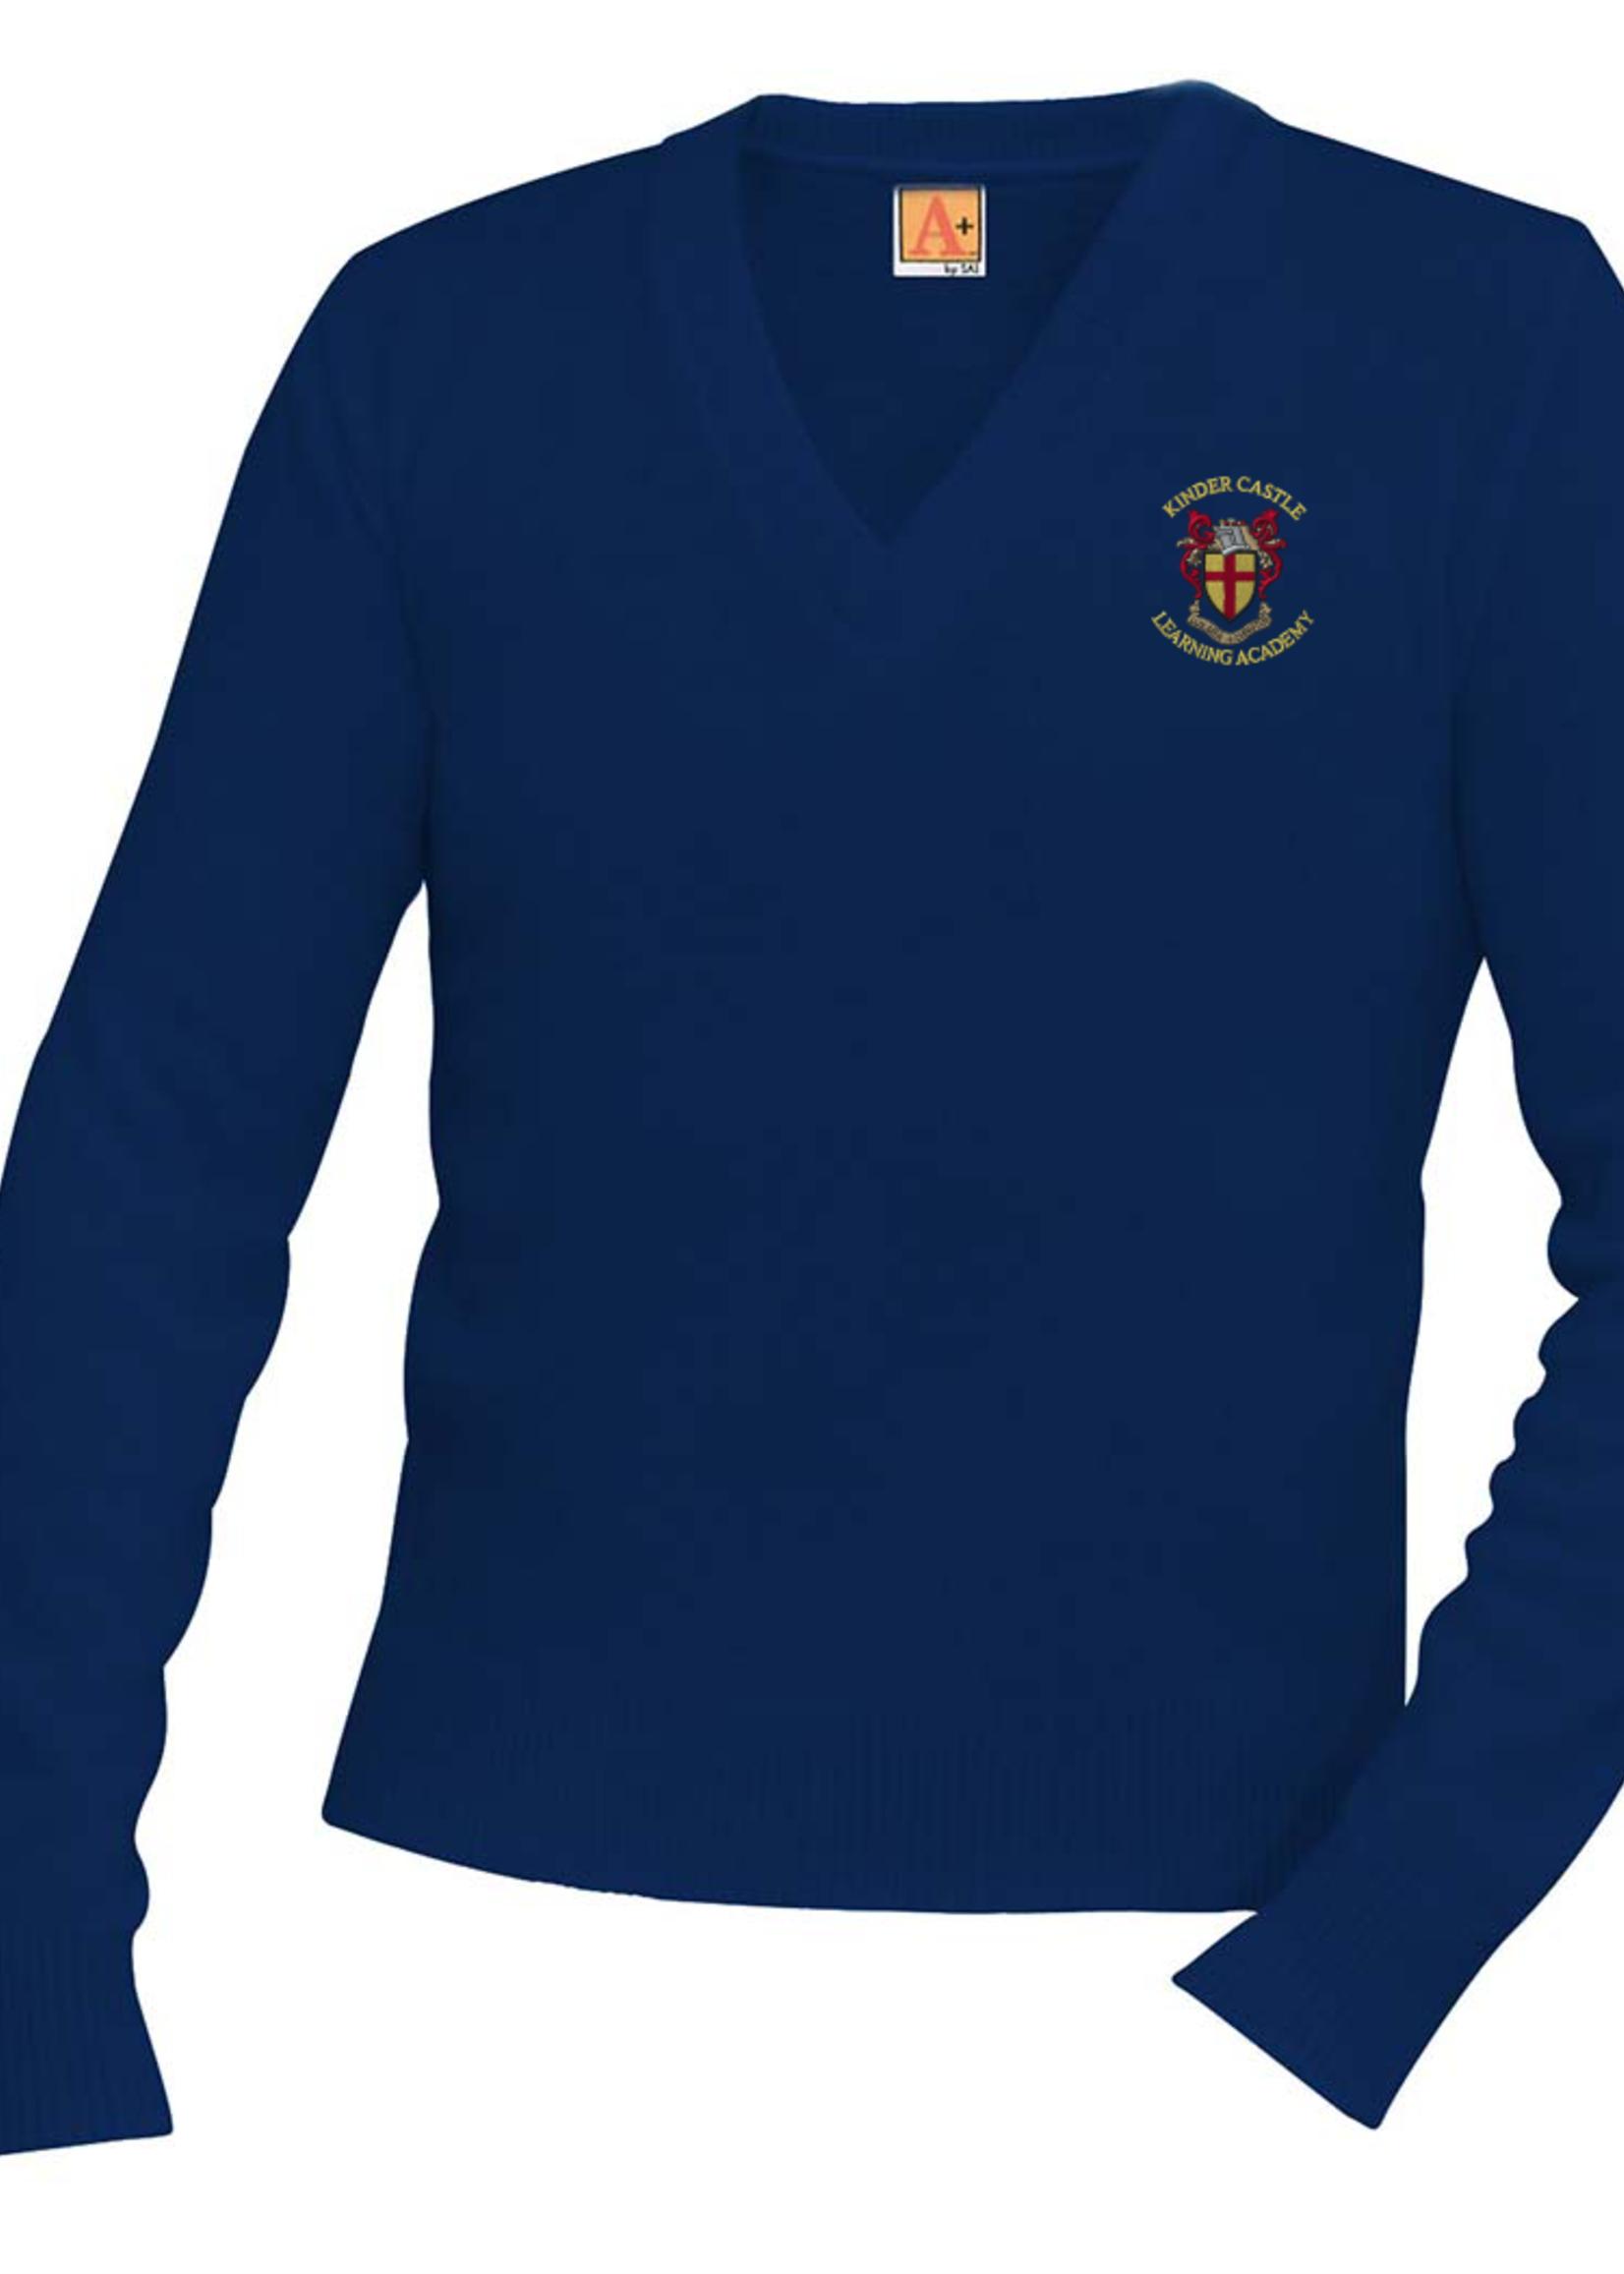 TUS KCLA Navy V-neck Pullover sweater